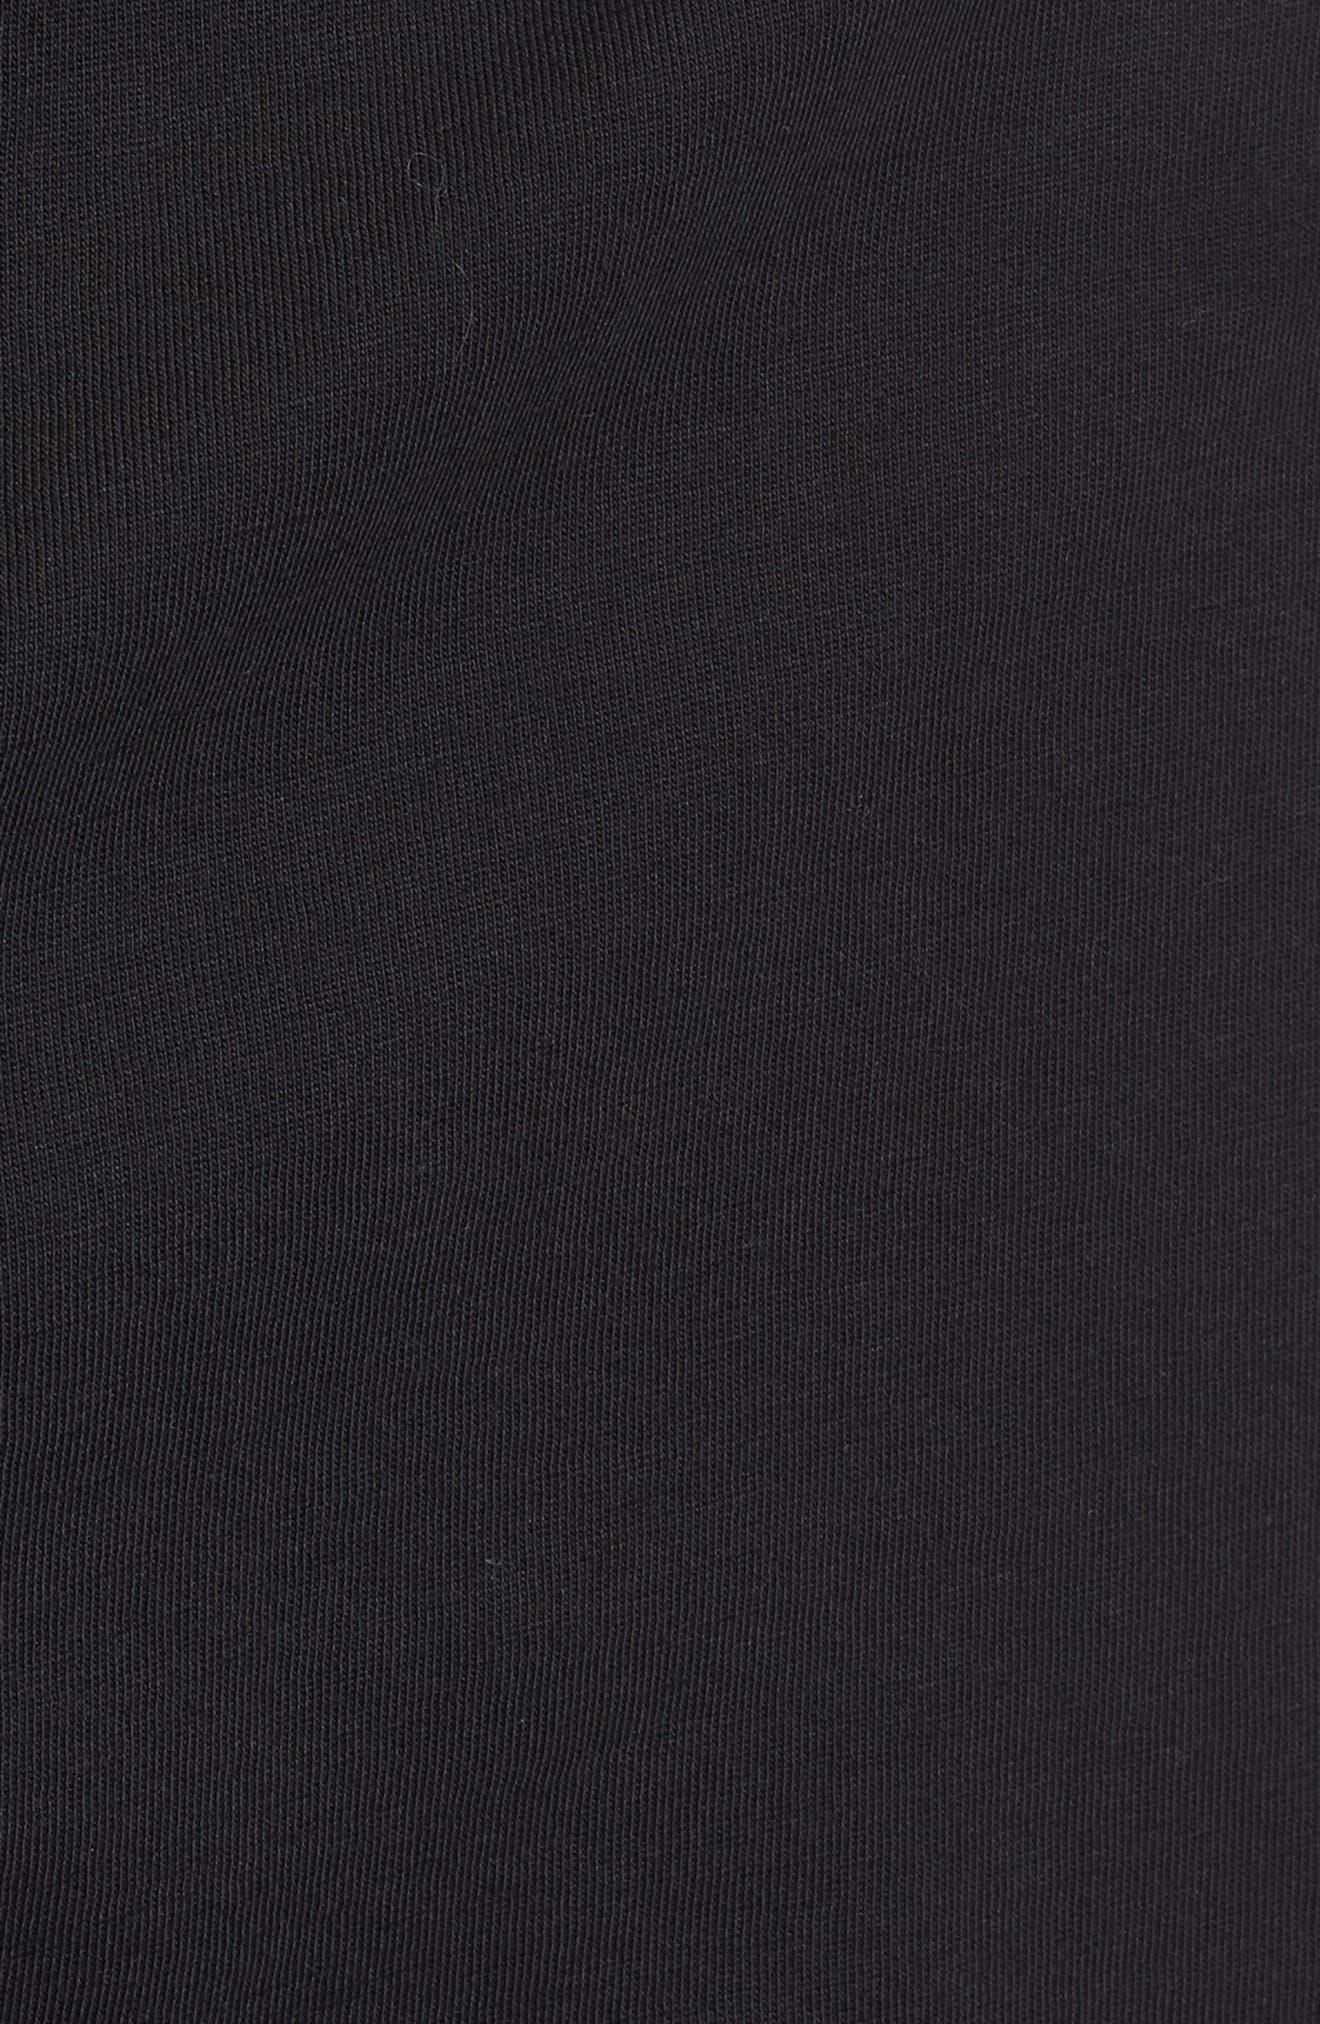 3-Pack Knit Boxers,                             Alternate thumbnail 5, color,                             Black